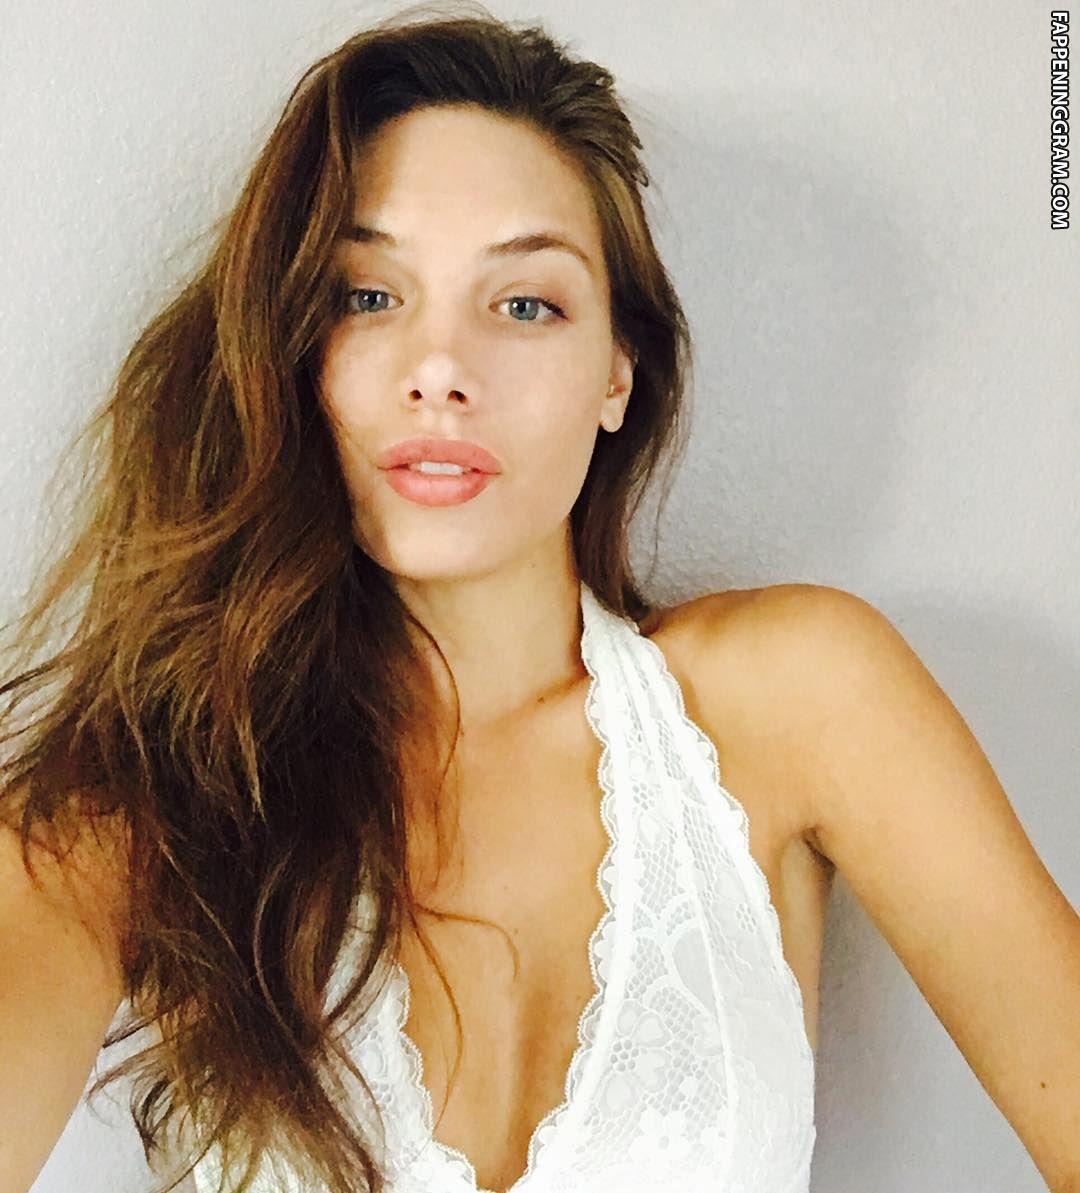 Kayla Jean Garvin Nude